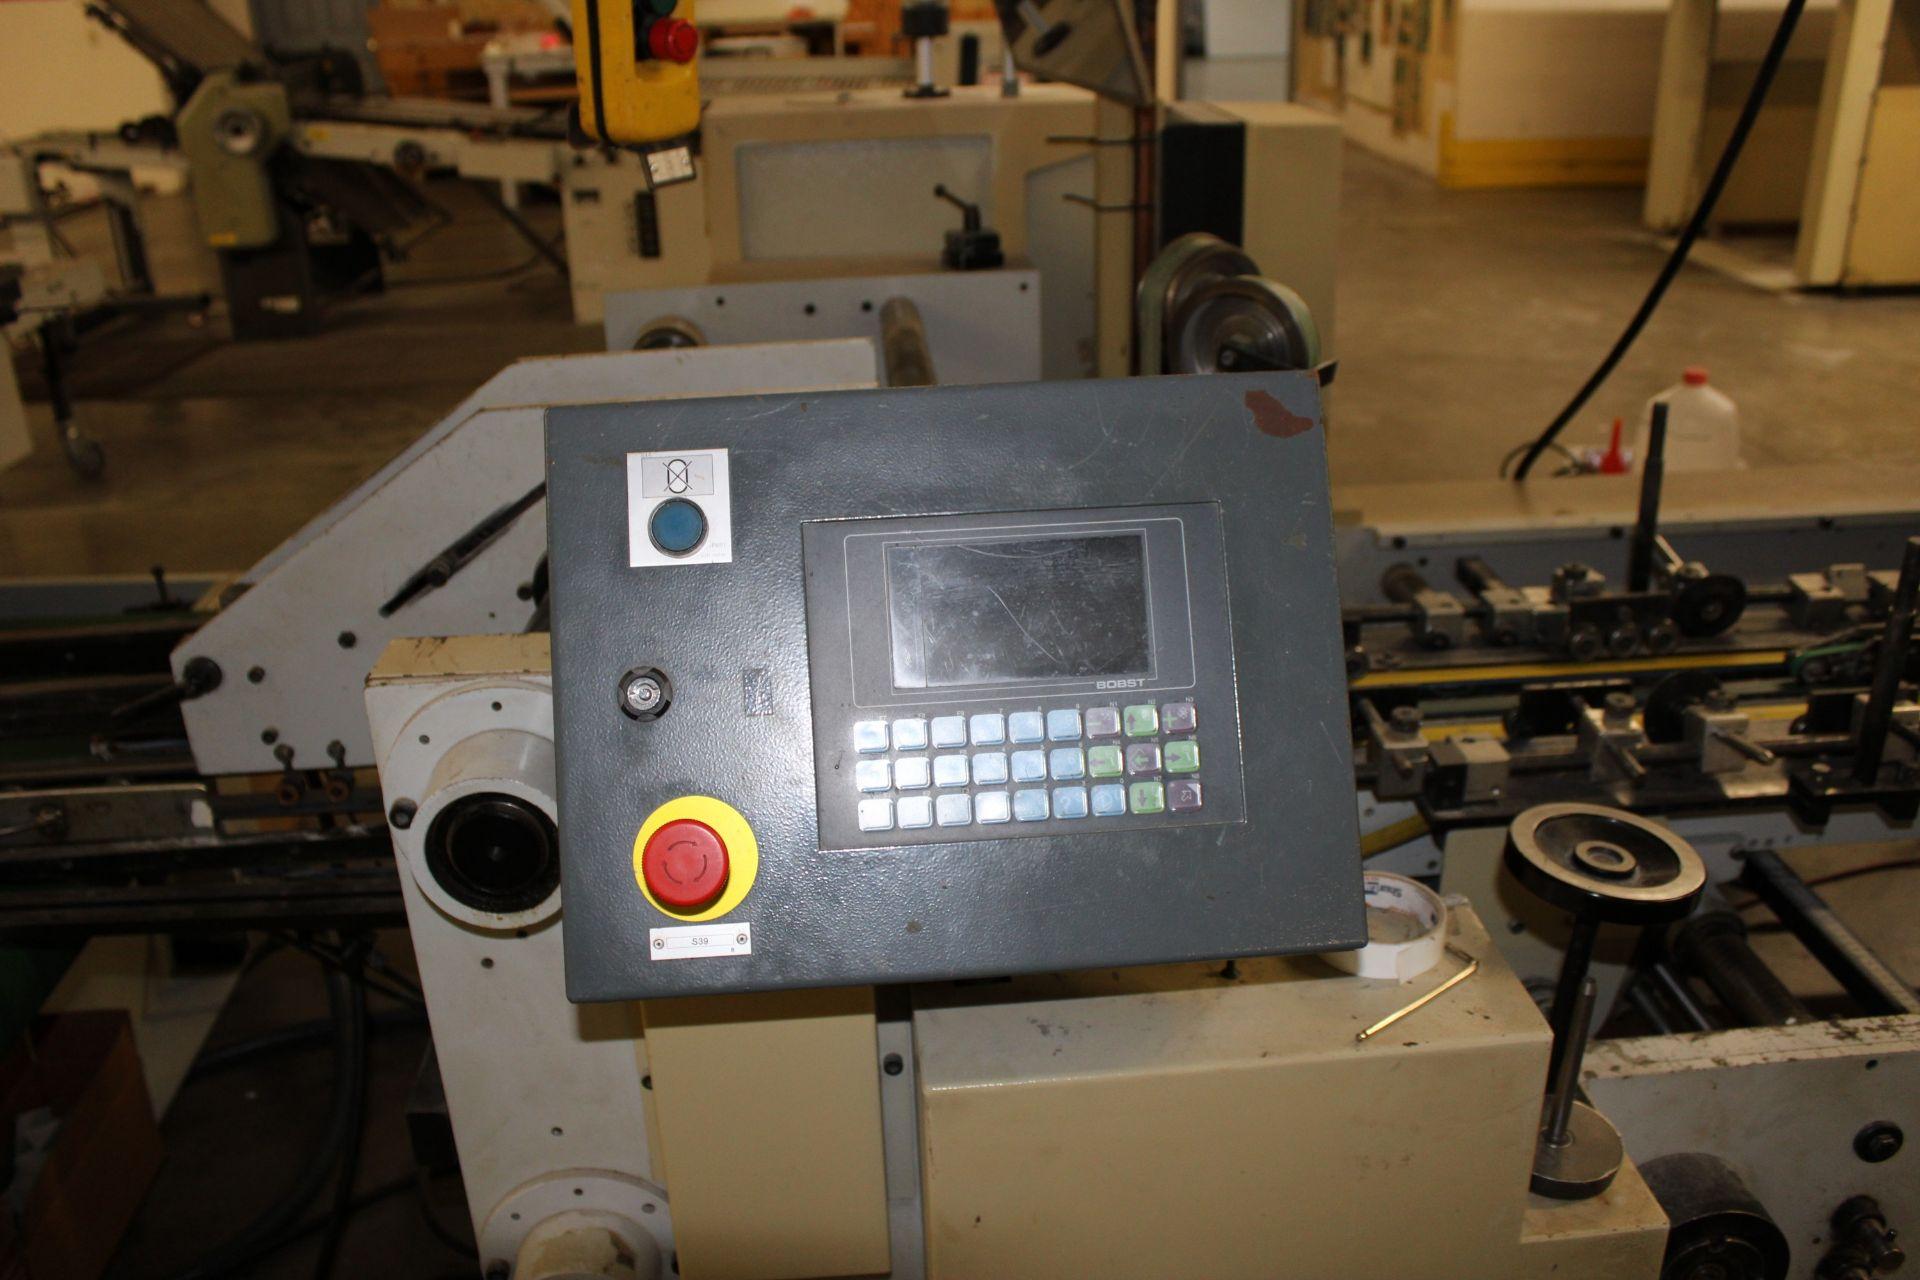 Lot 34 - 1997 BOBST Media 100 II-A2 Folder/Gluer w/ Heavy Duty PAFRA PDC Controls s/n 0341-062-03